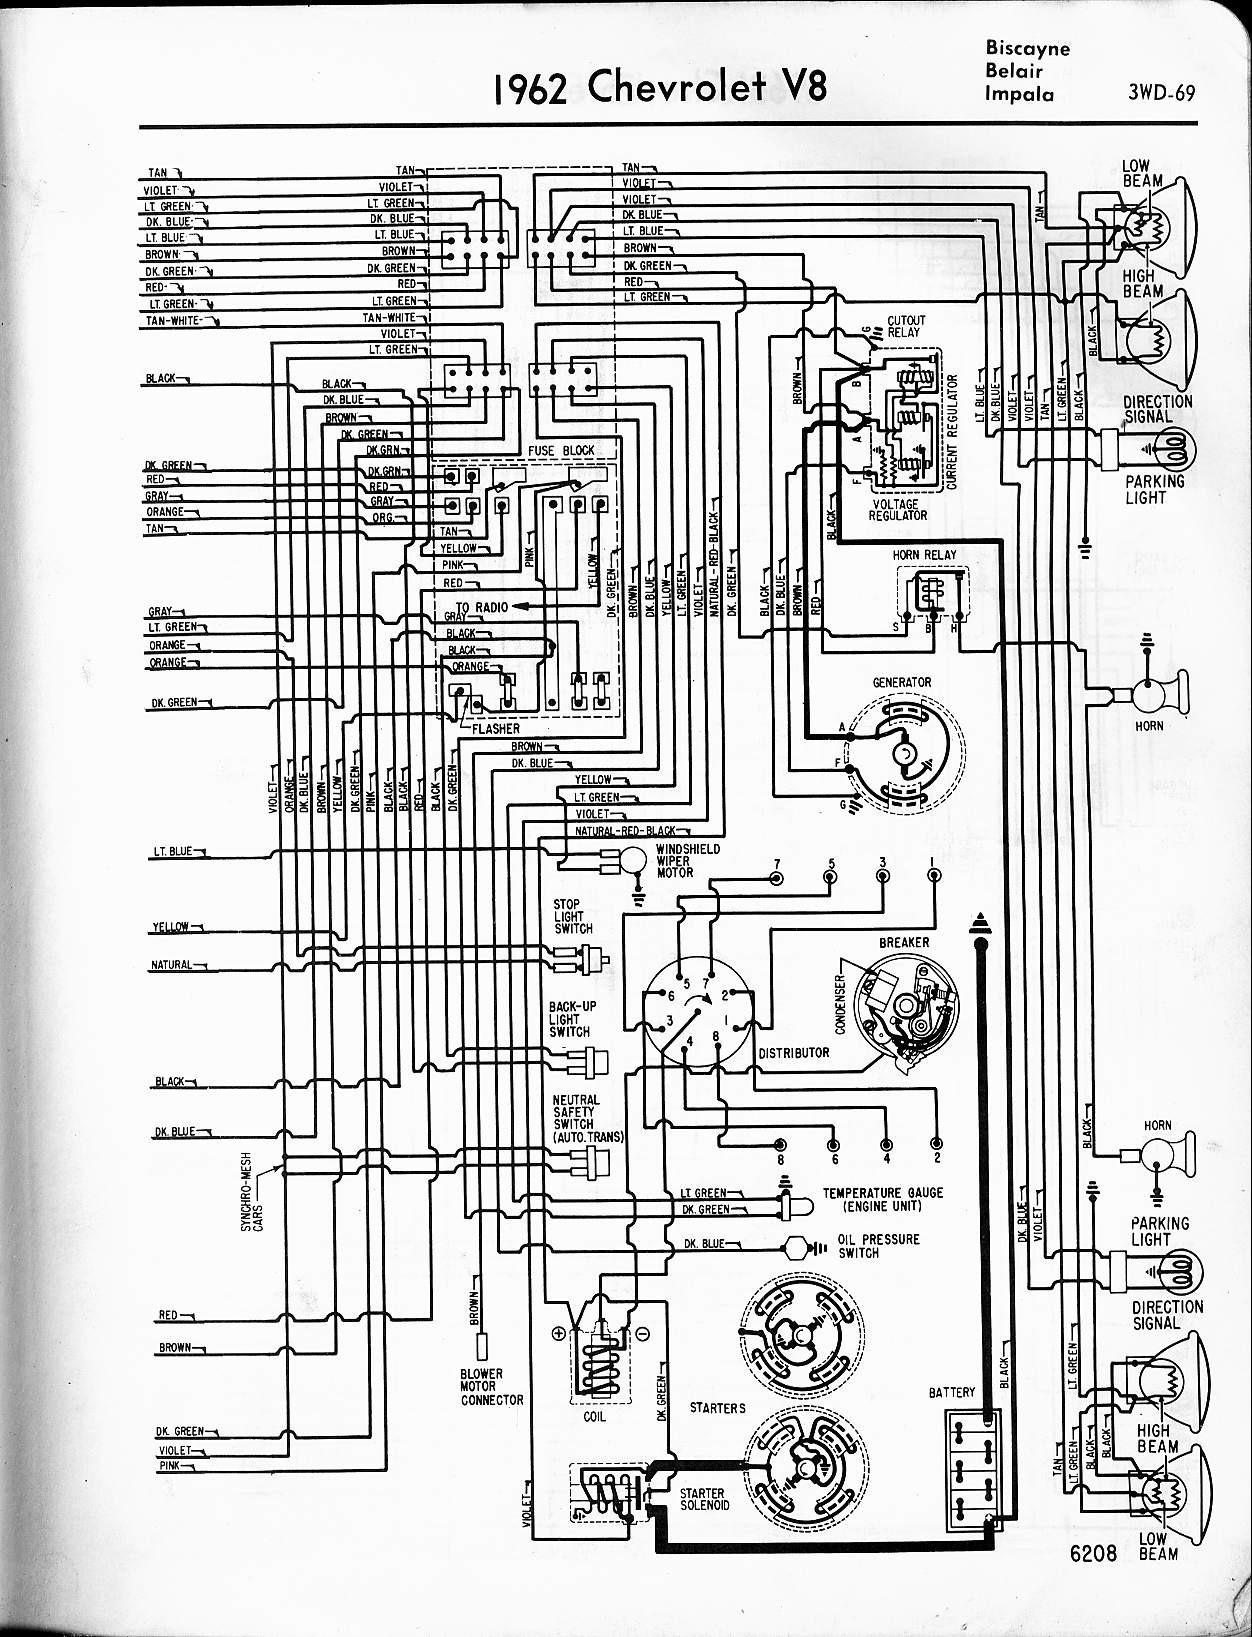 Up A Chevy Starter Wiring | Wiring Liry  Chevy Starter Wiring Diagram on